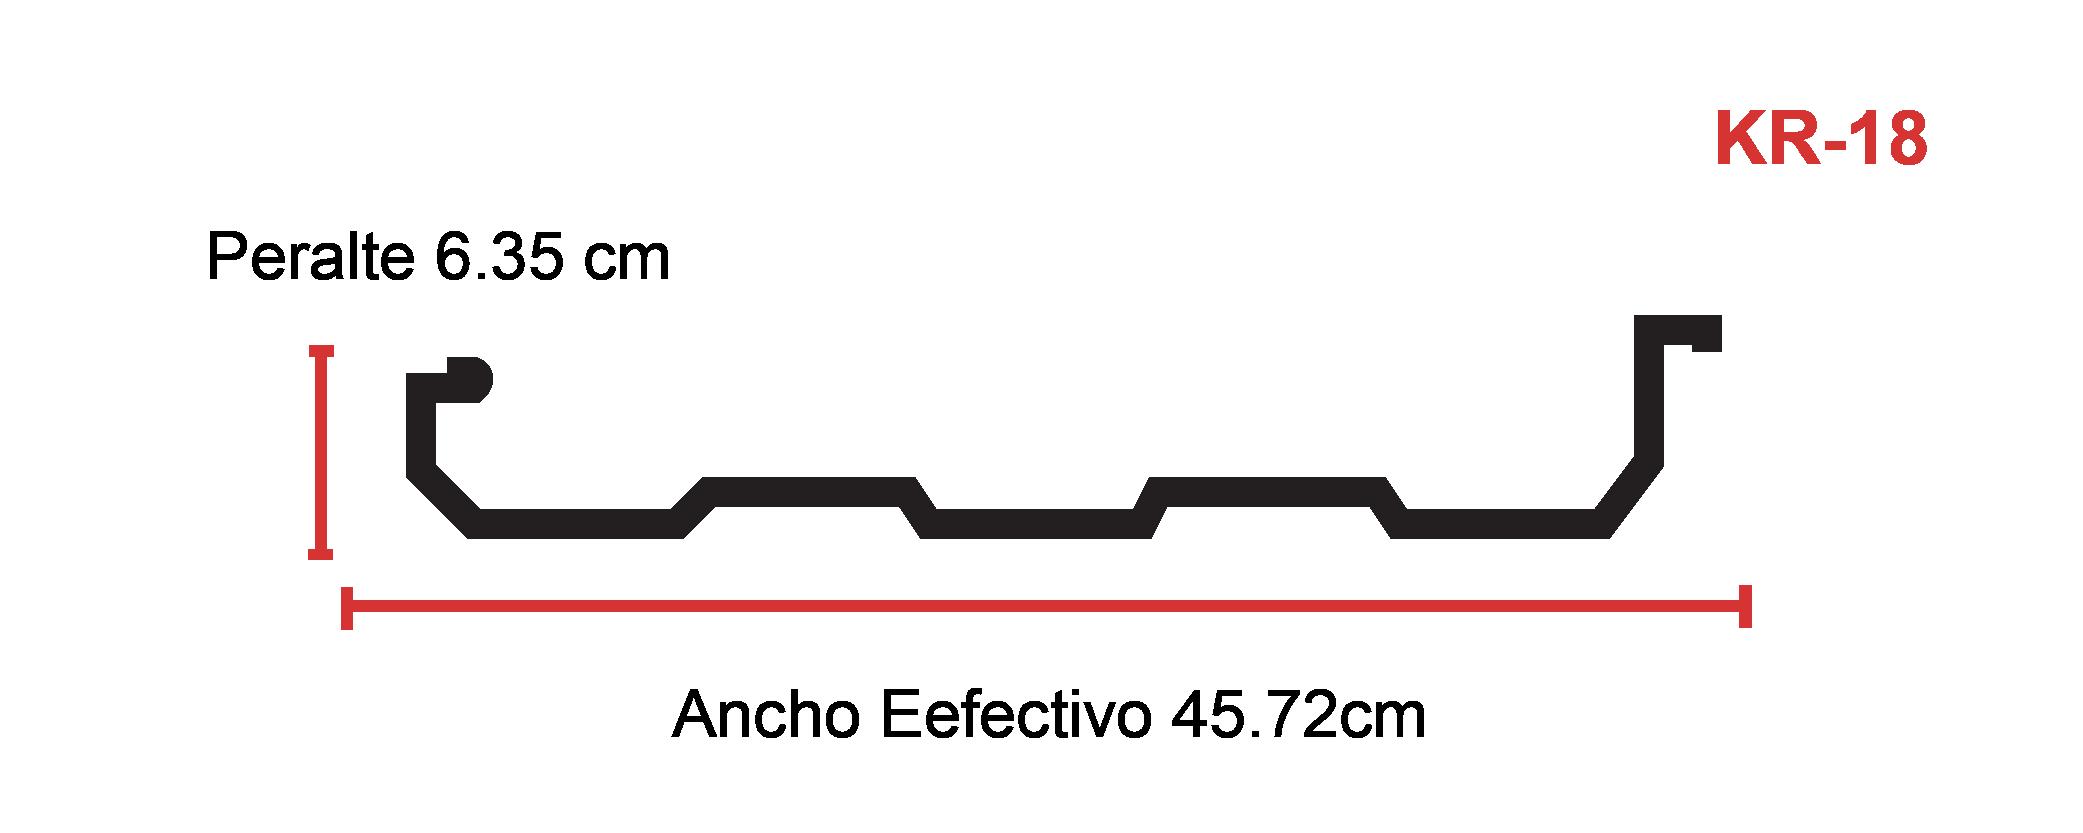 Medidas de la lámina KR-18 de acero.